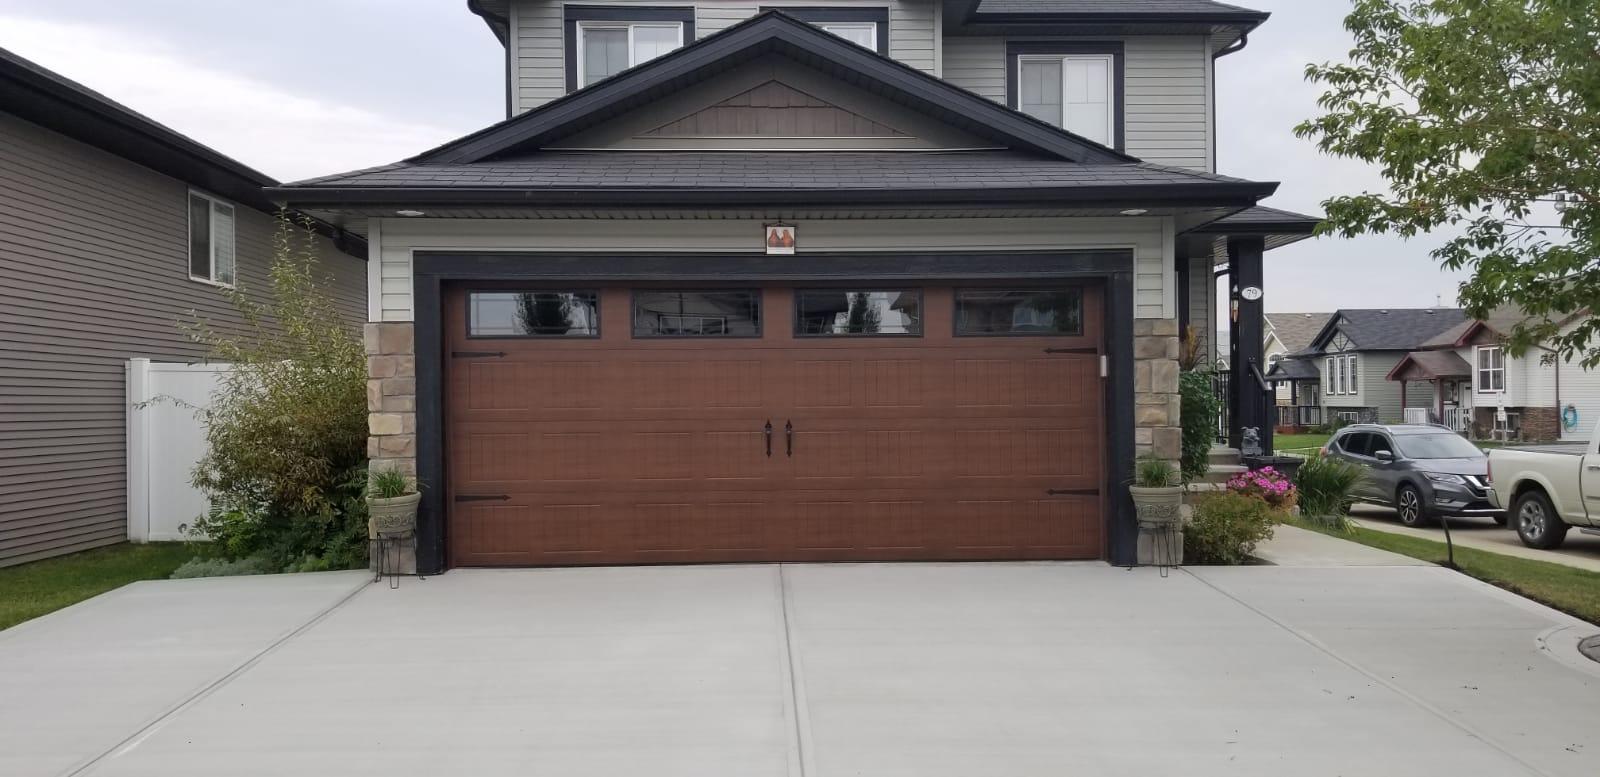 black roof house, brown wood garage, and paved driveway in red deer